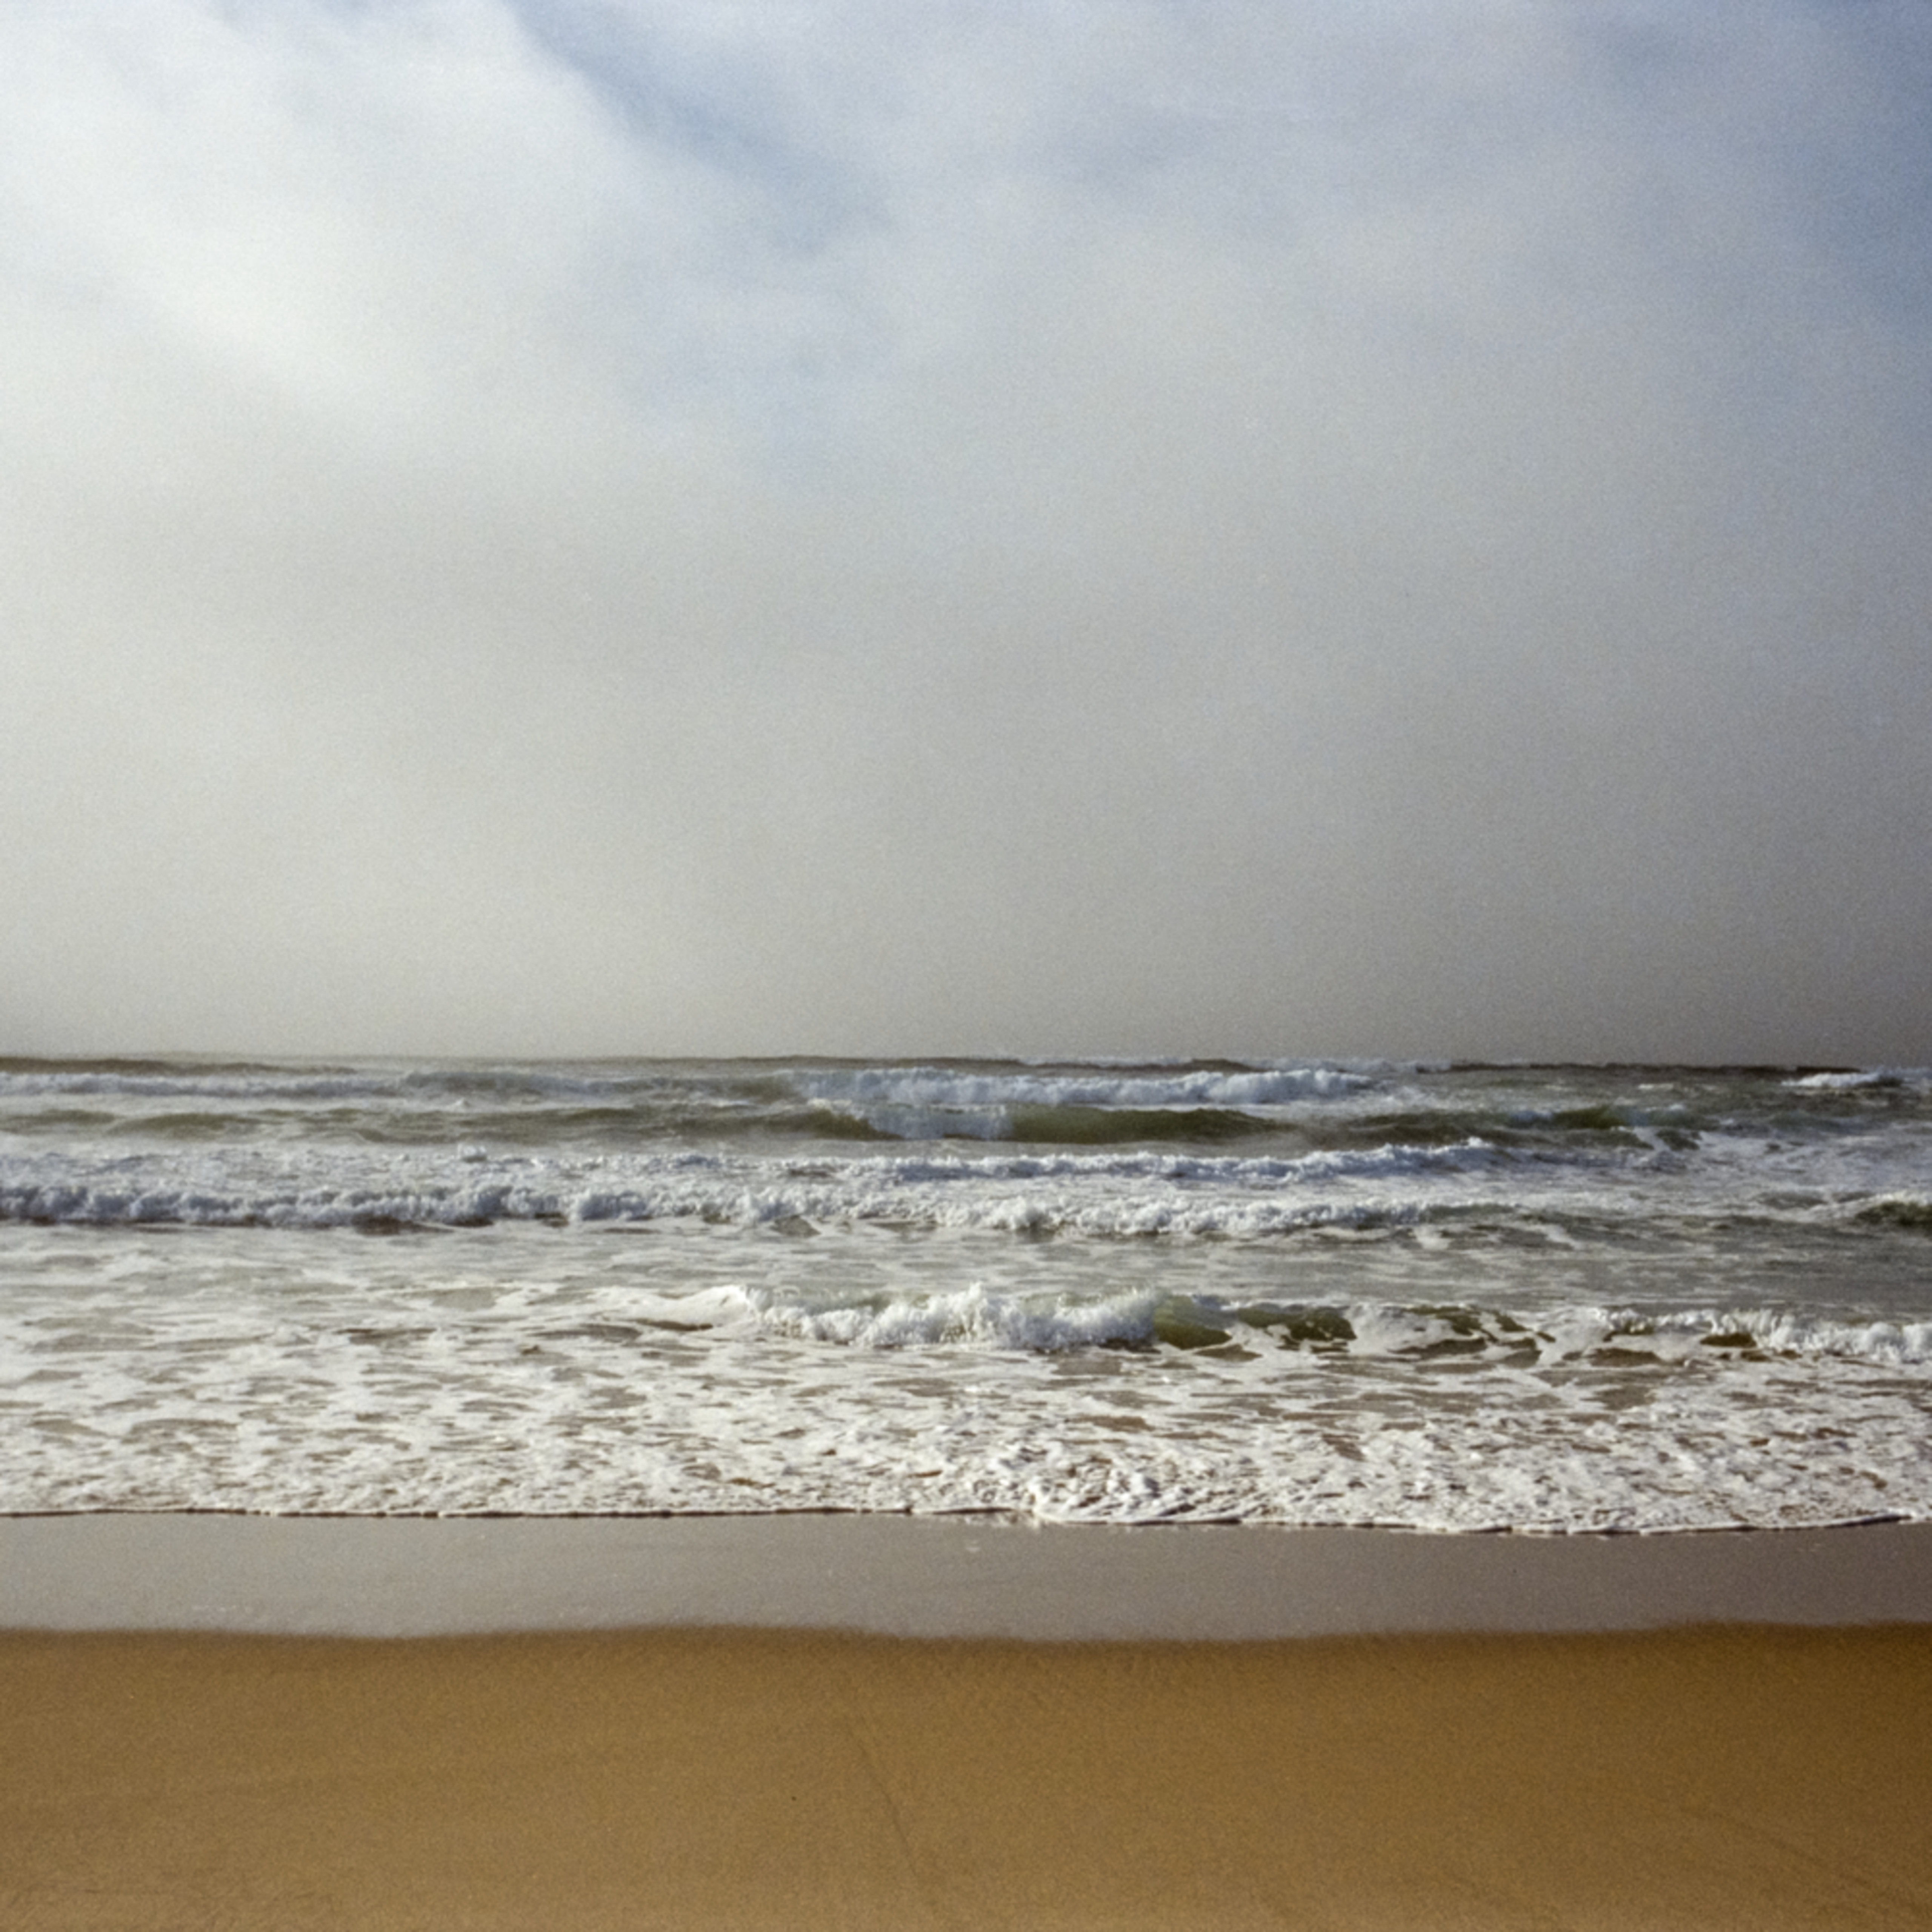 Waves and fogbank surfbeachca tpnhet